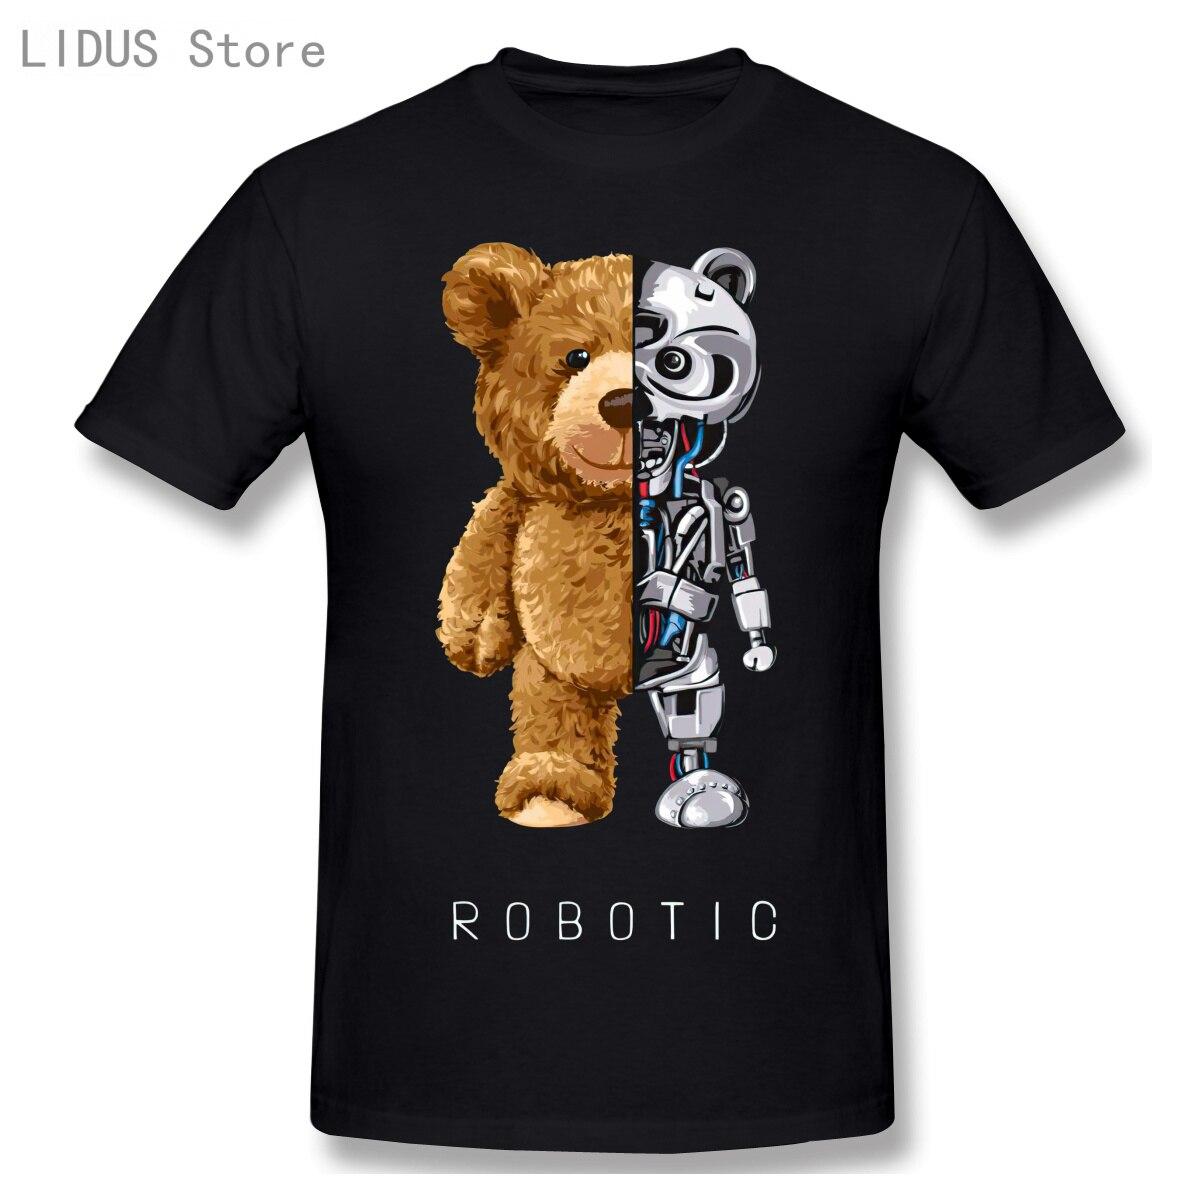 AliExpress - 2021 New Funny Teddy Bear Robot Tshirt Robotic Bear Shirt Casual Clothes Men Fashion Clothing Cotton T-Shirt Tee Top